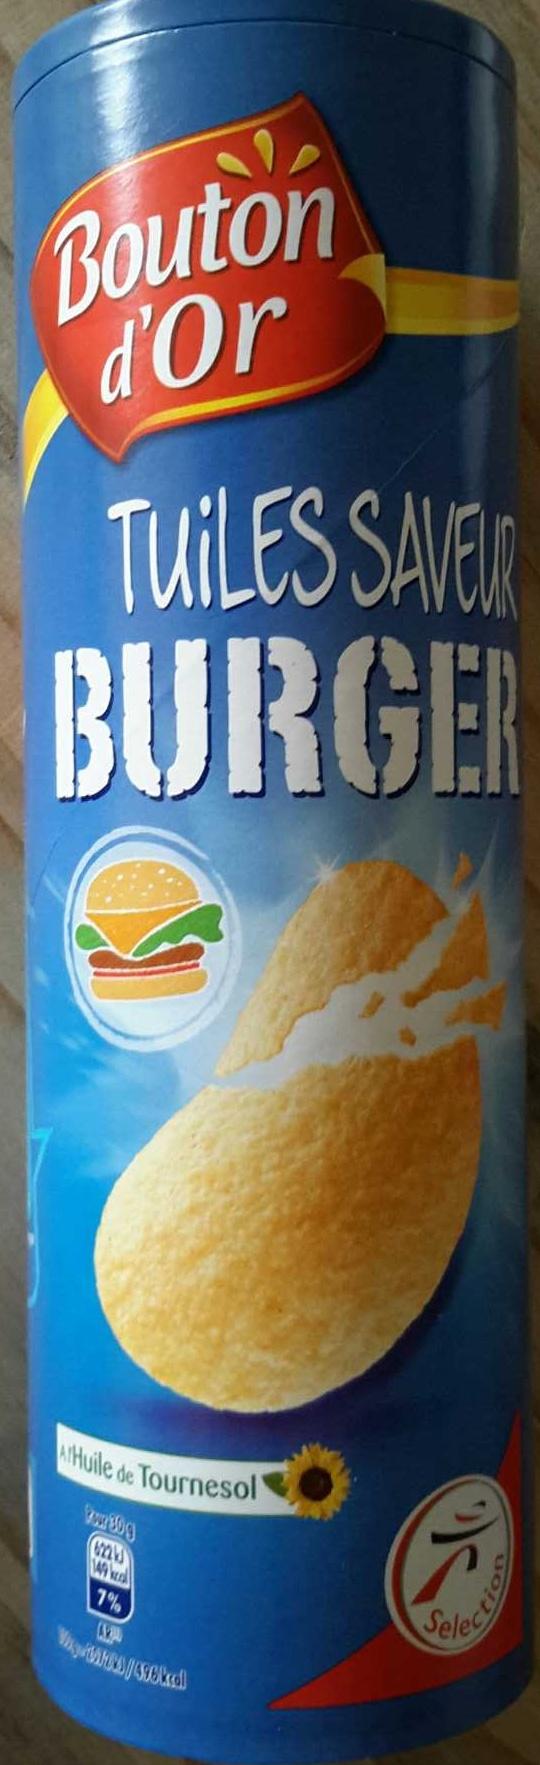 Tuiles saveur burger - Product - fr